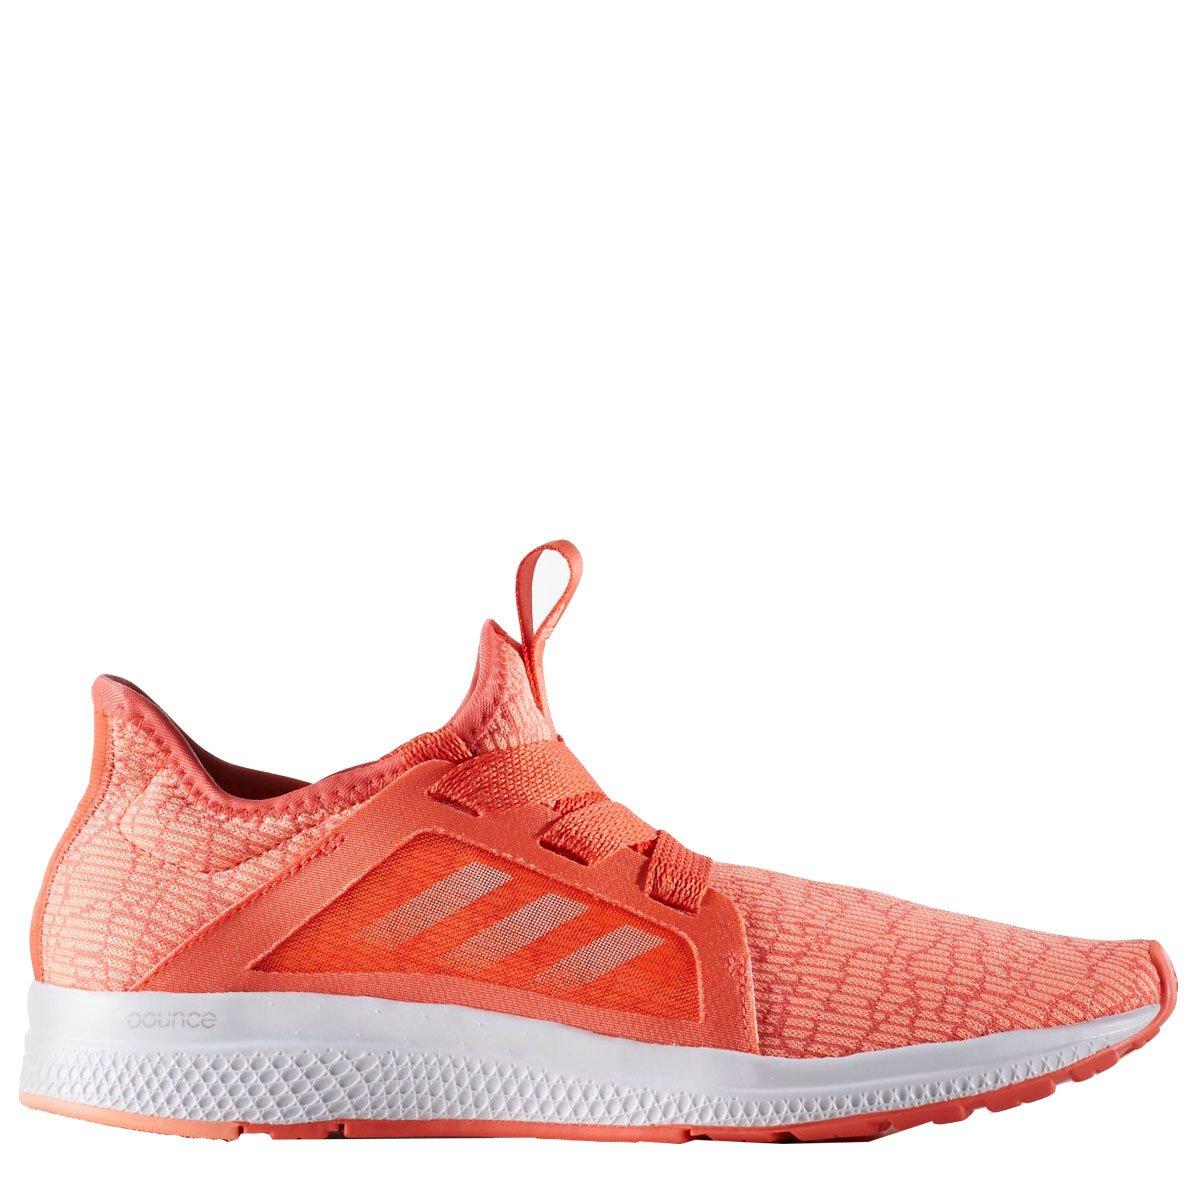 34cd59f4f9 Bizz Store - Tênis Feminino Adidas Edge Lux Corrida